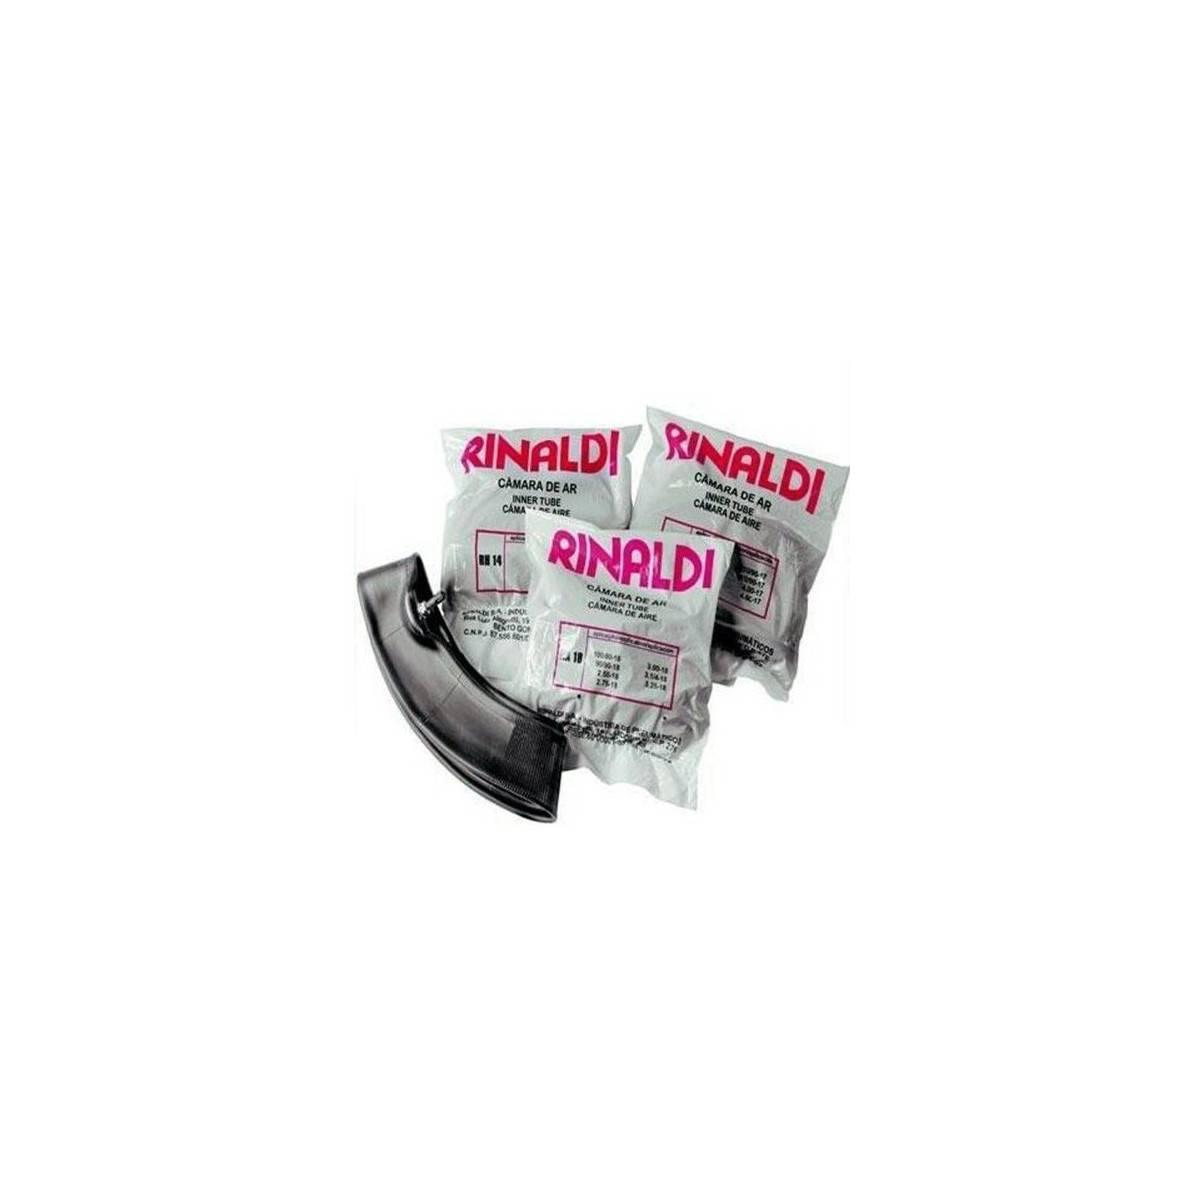 RB16 - Camara Rinaldi 90 100-16